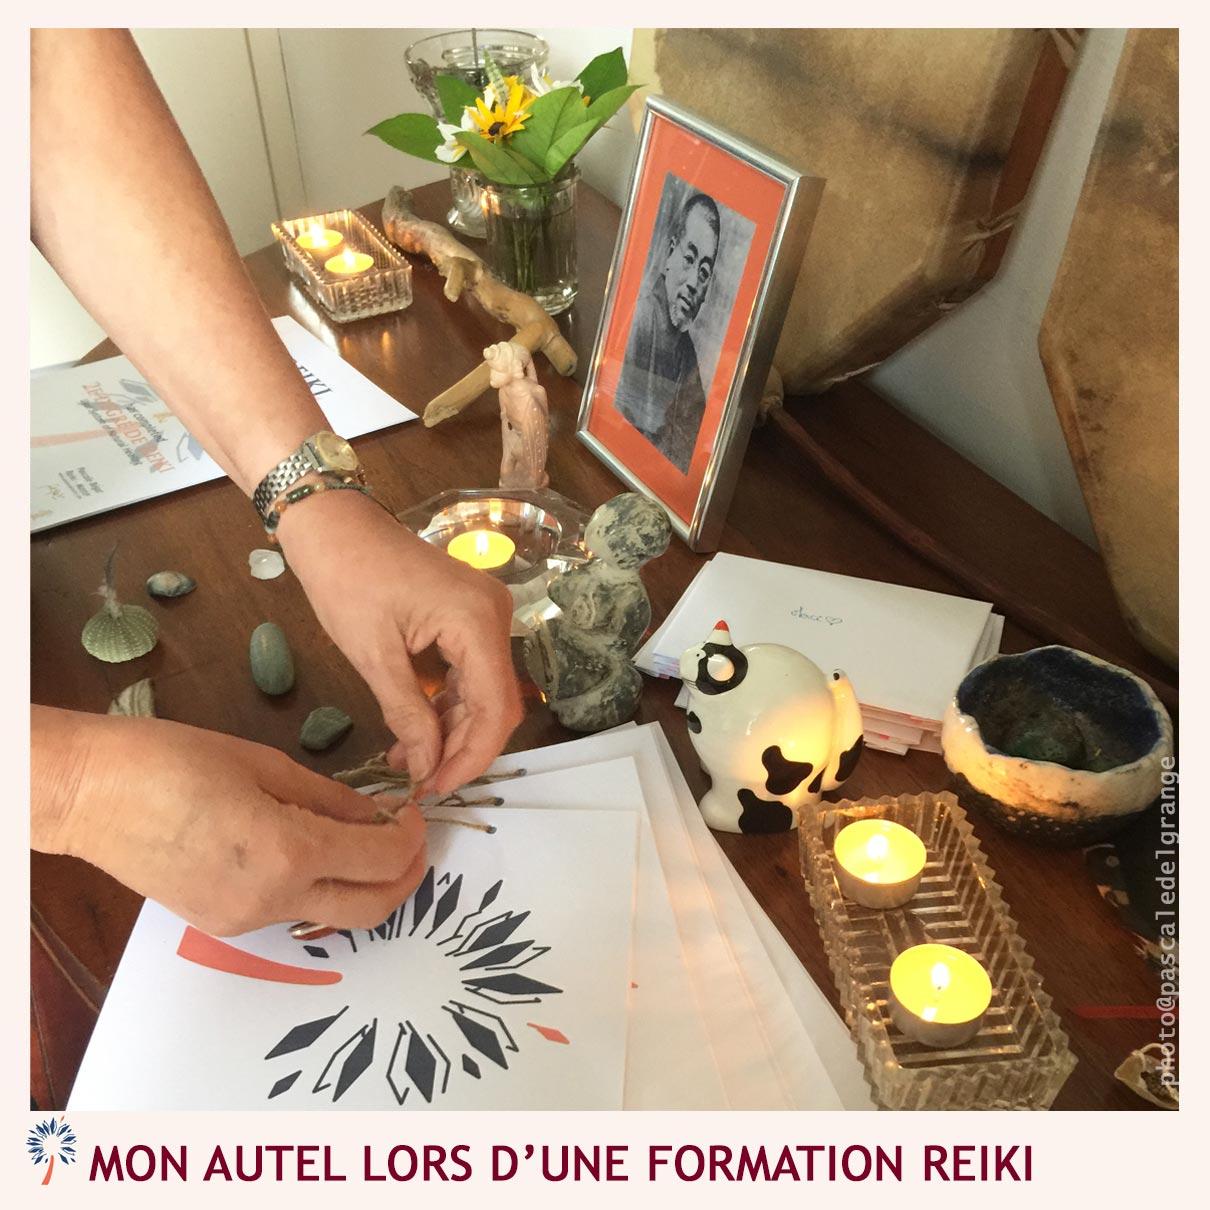 autel formation Reiki